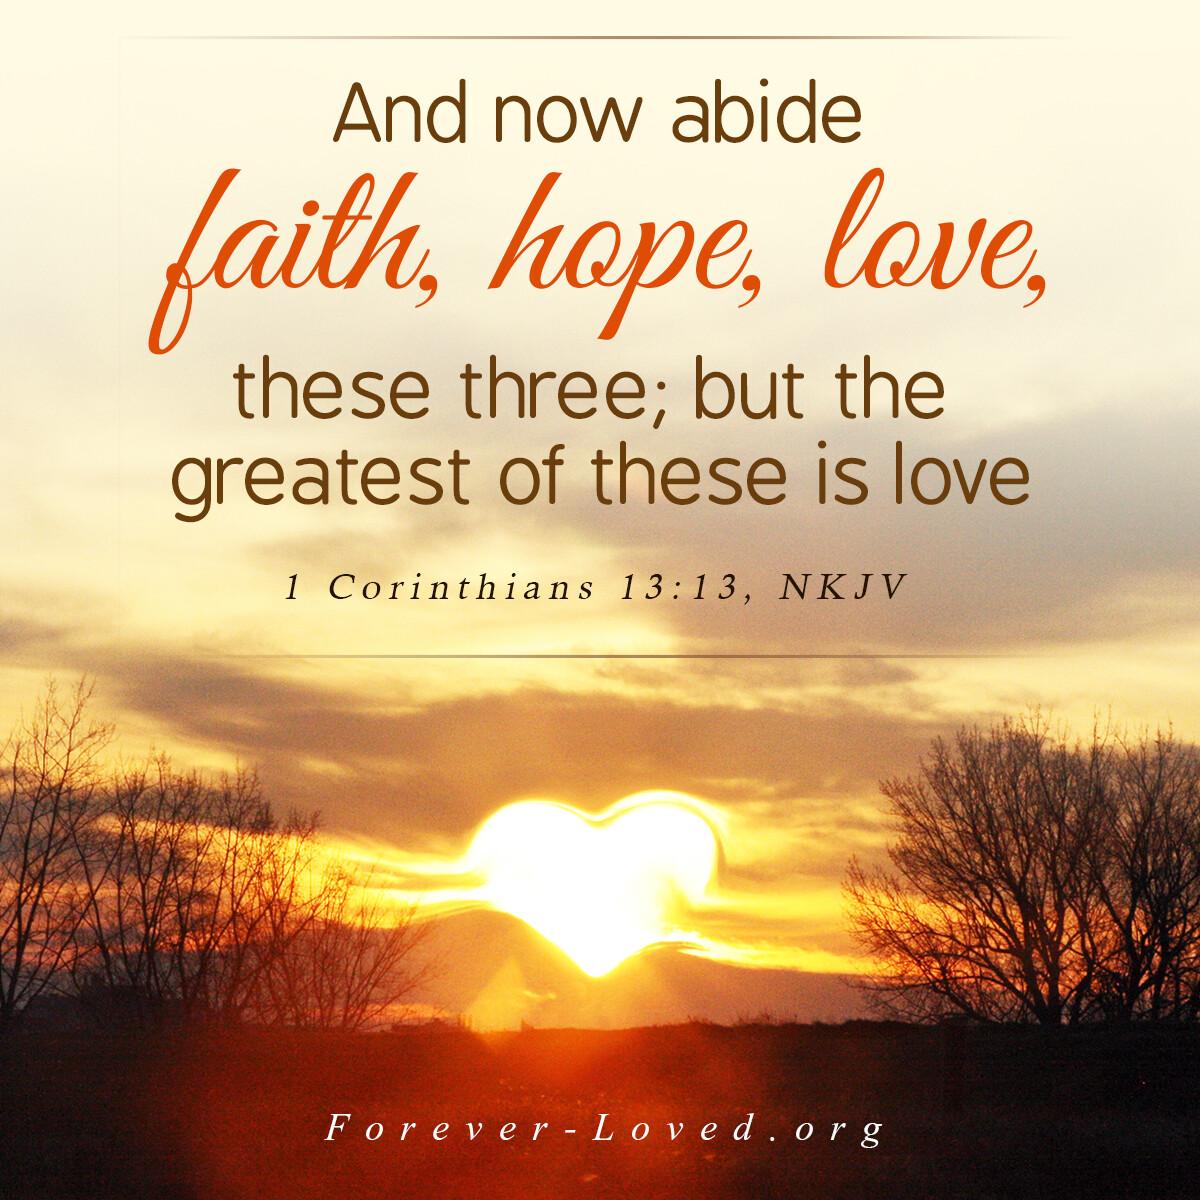 Posters with Inspirational Bible Verses | JesusOnline.com